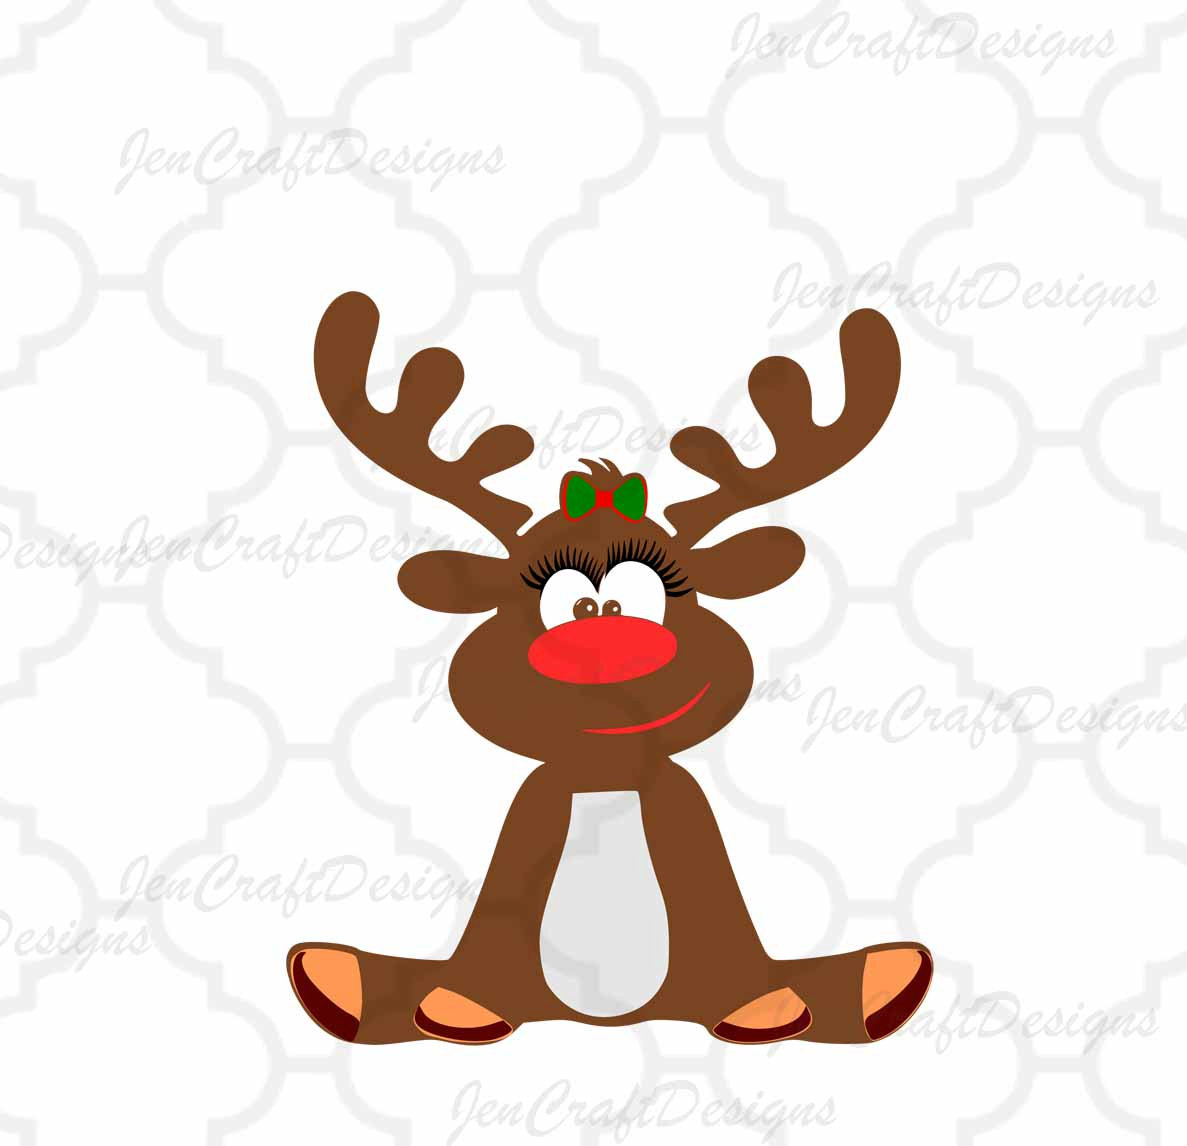 christmas reindeer clipart at getdrawings com free for personal rh getdrawings com reindeer clip art free images free reindeer clipart images